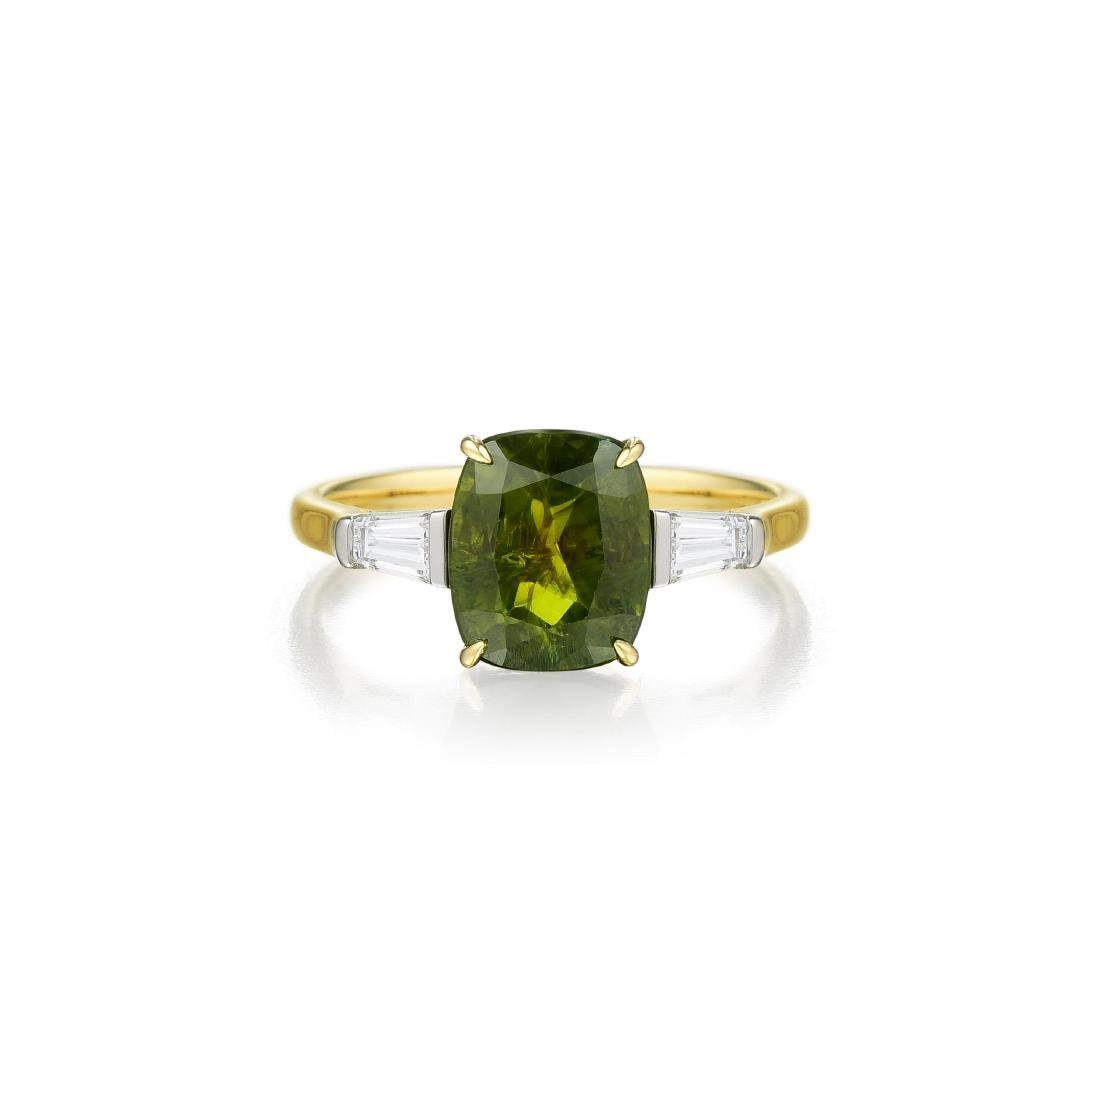 An 18K Gold Demantoid Garnet and Diamond Ring